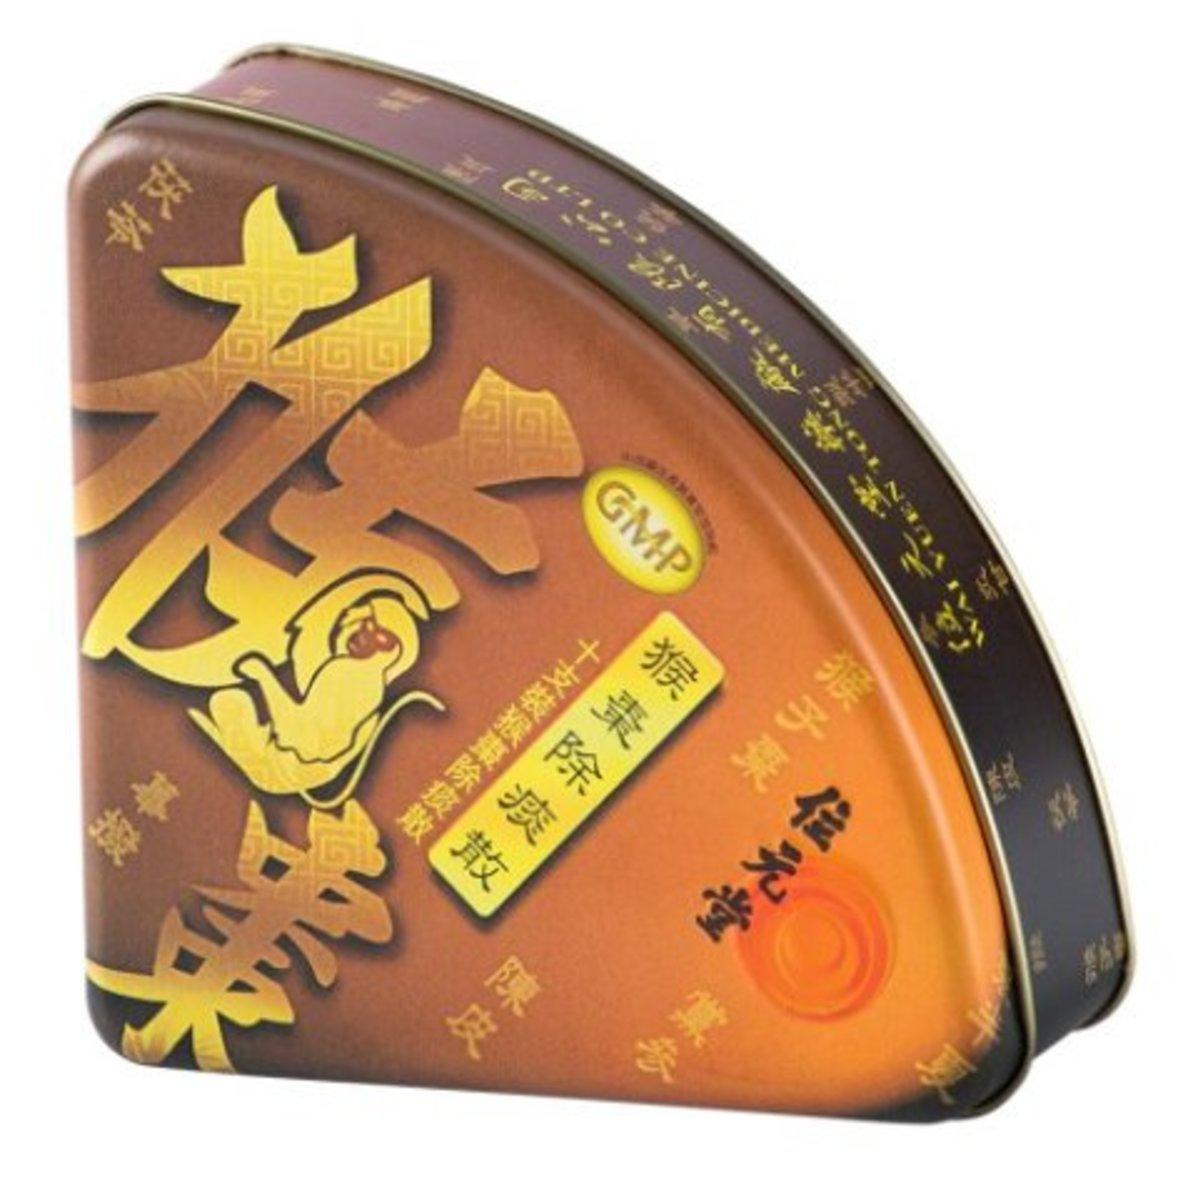 Hou Tsao Powder 10pcs